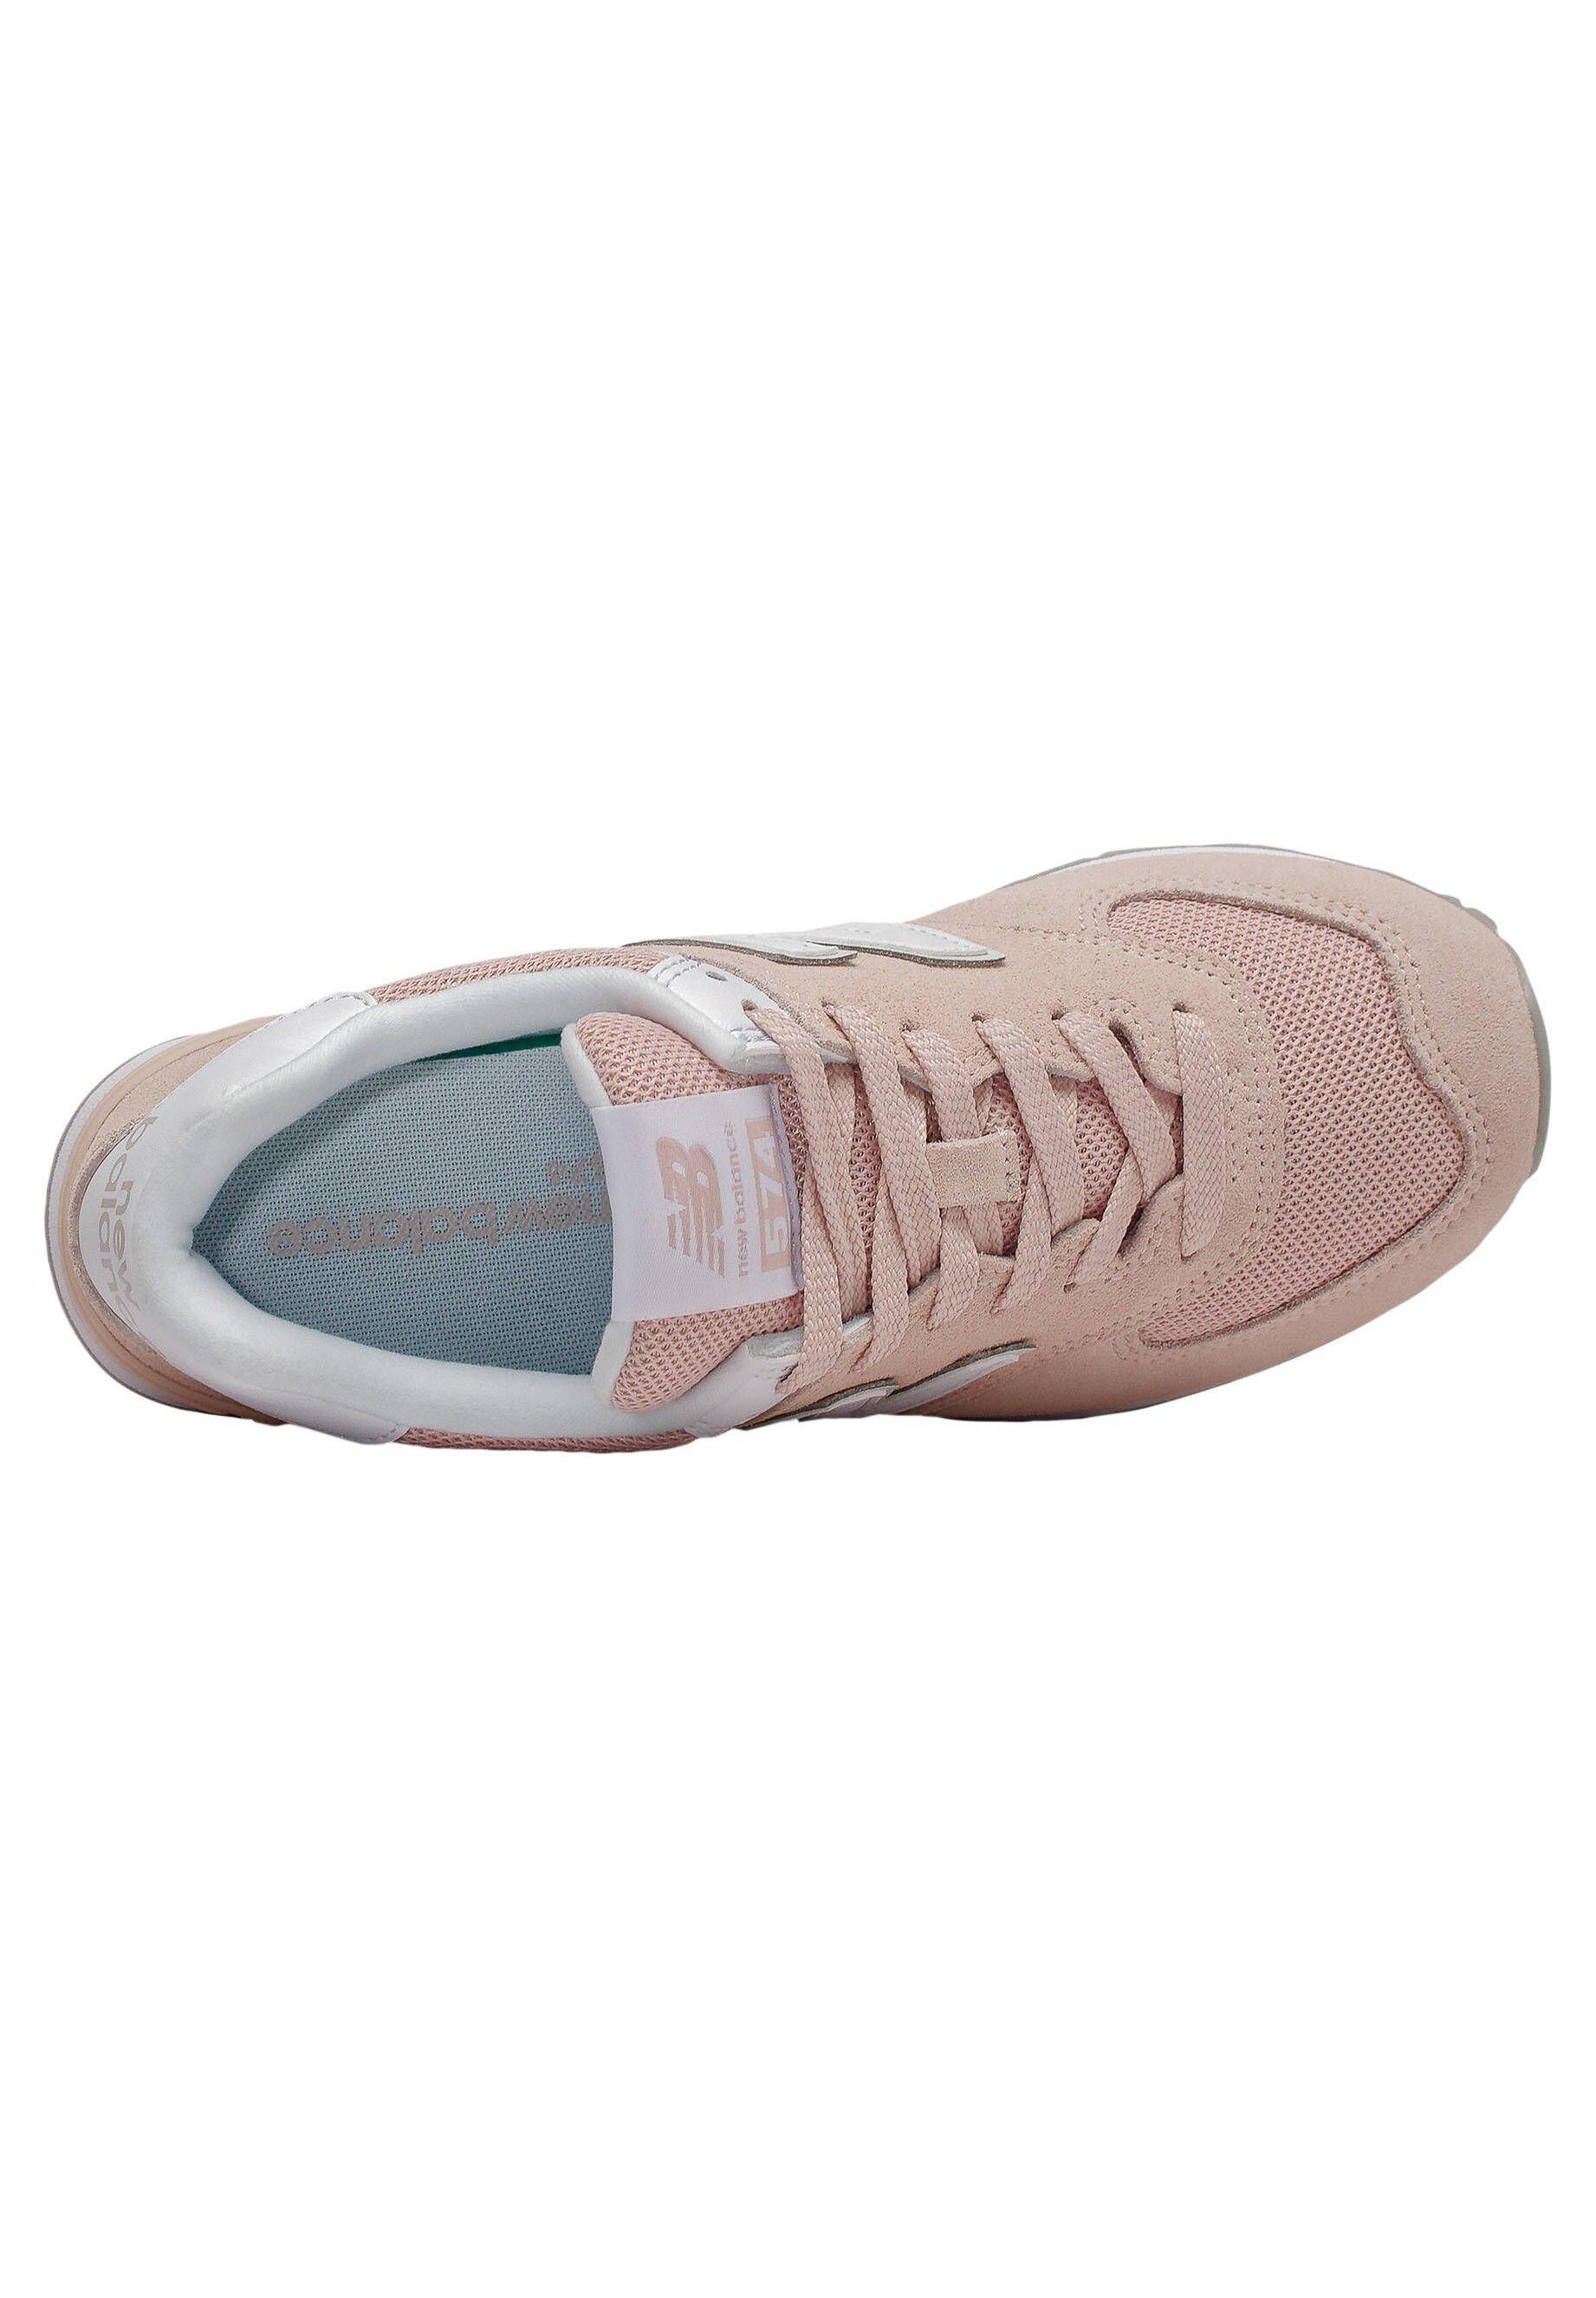 New Balance WL574 - Sneakers basse - rosa (311)/rosa - Zalando.it